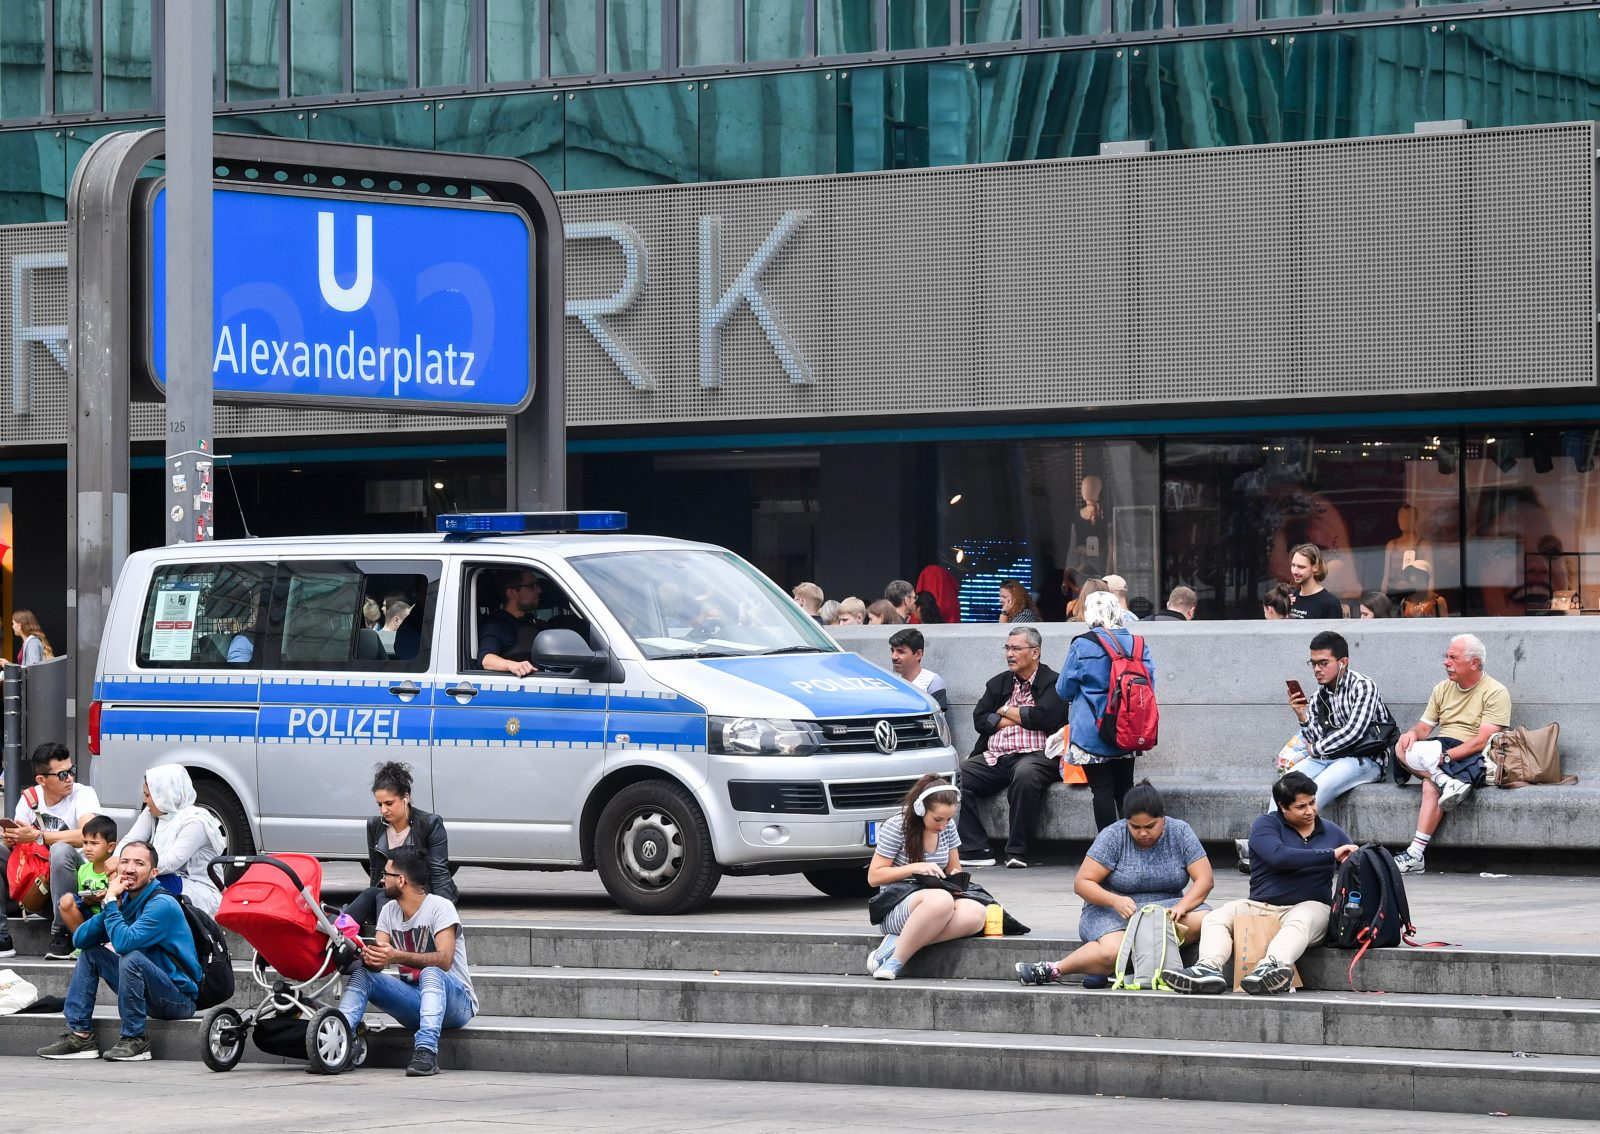 Polizei am Alexanderplatz